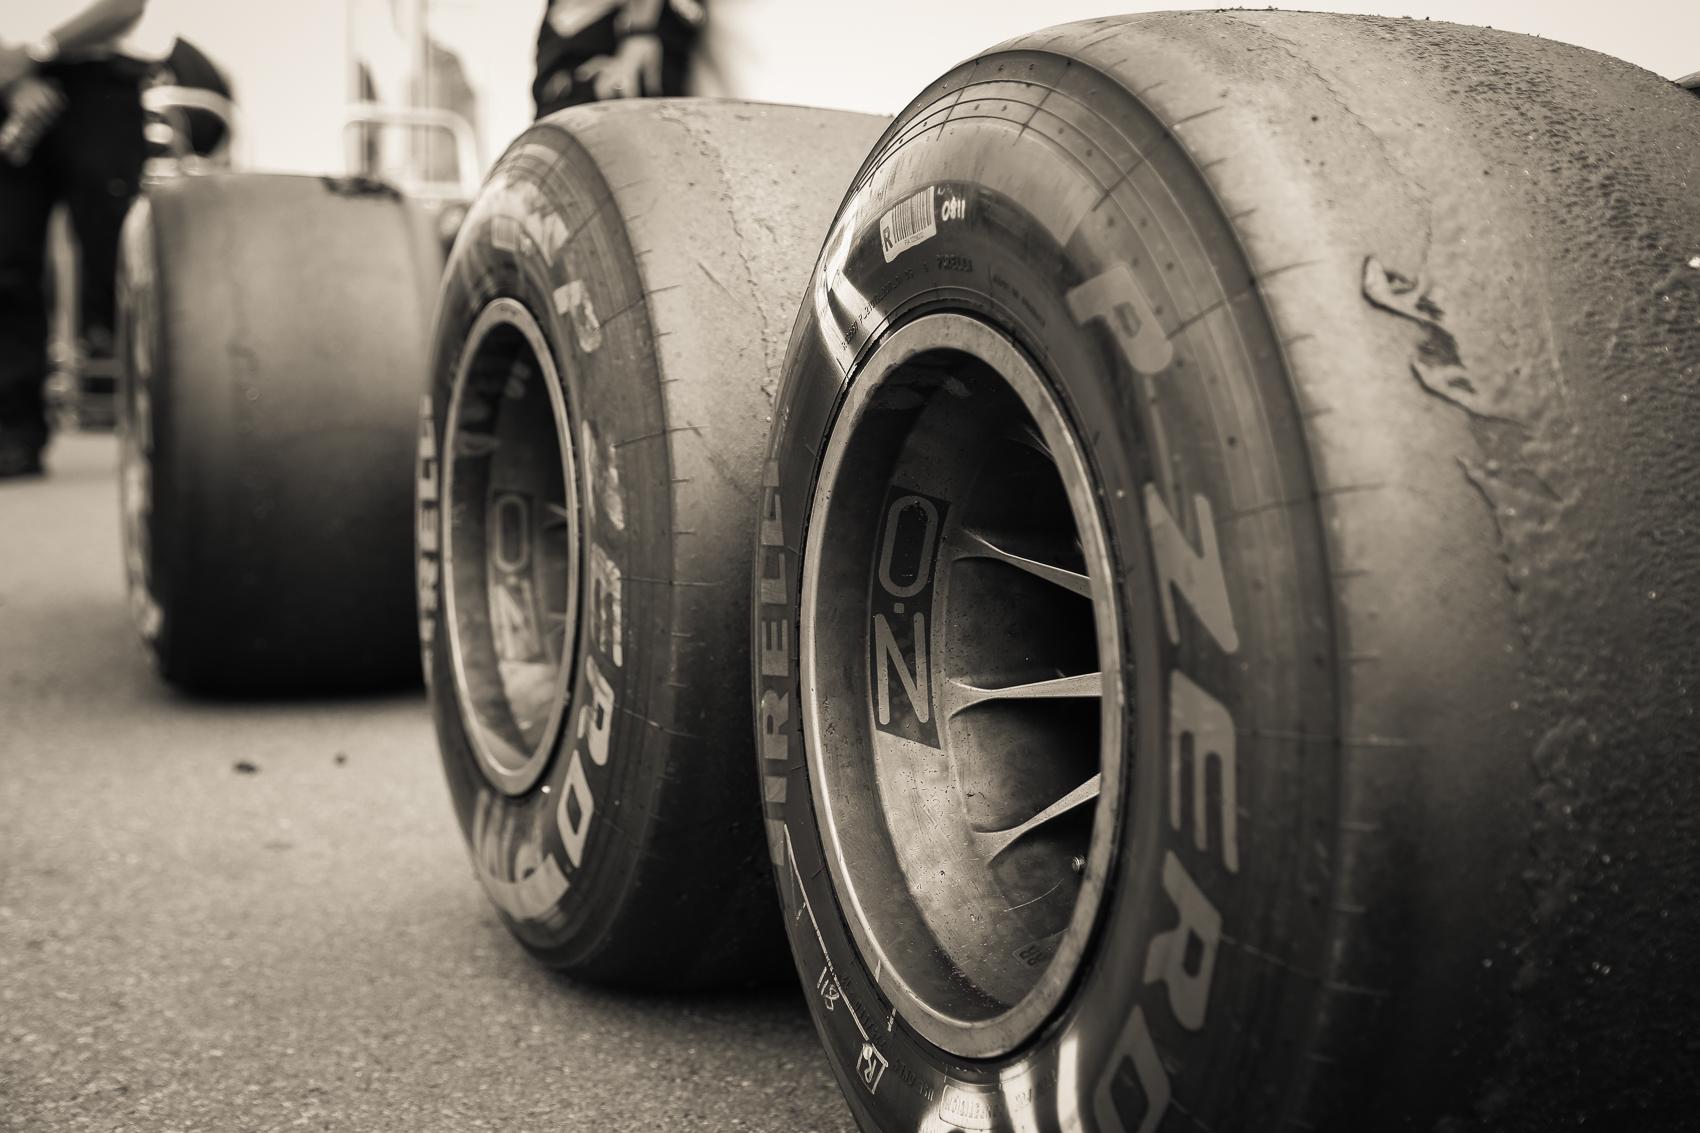 IMG_3825-Pirelli F1 tire.jpg